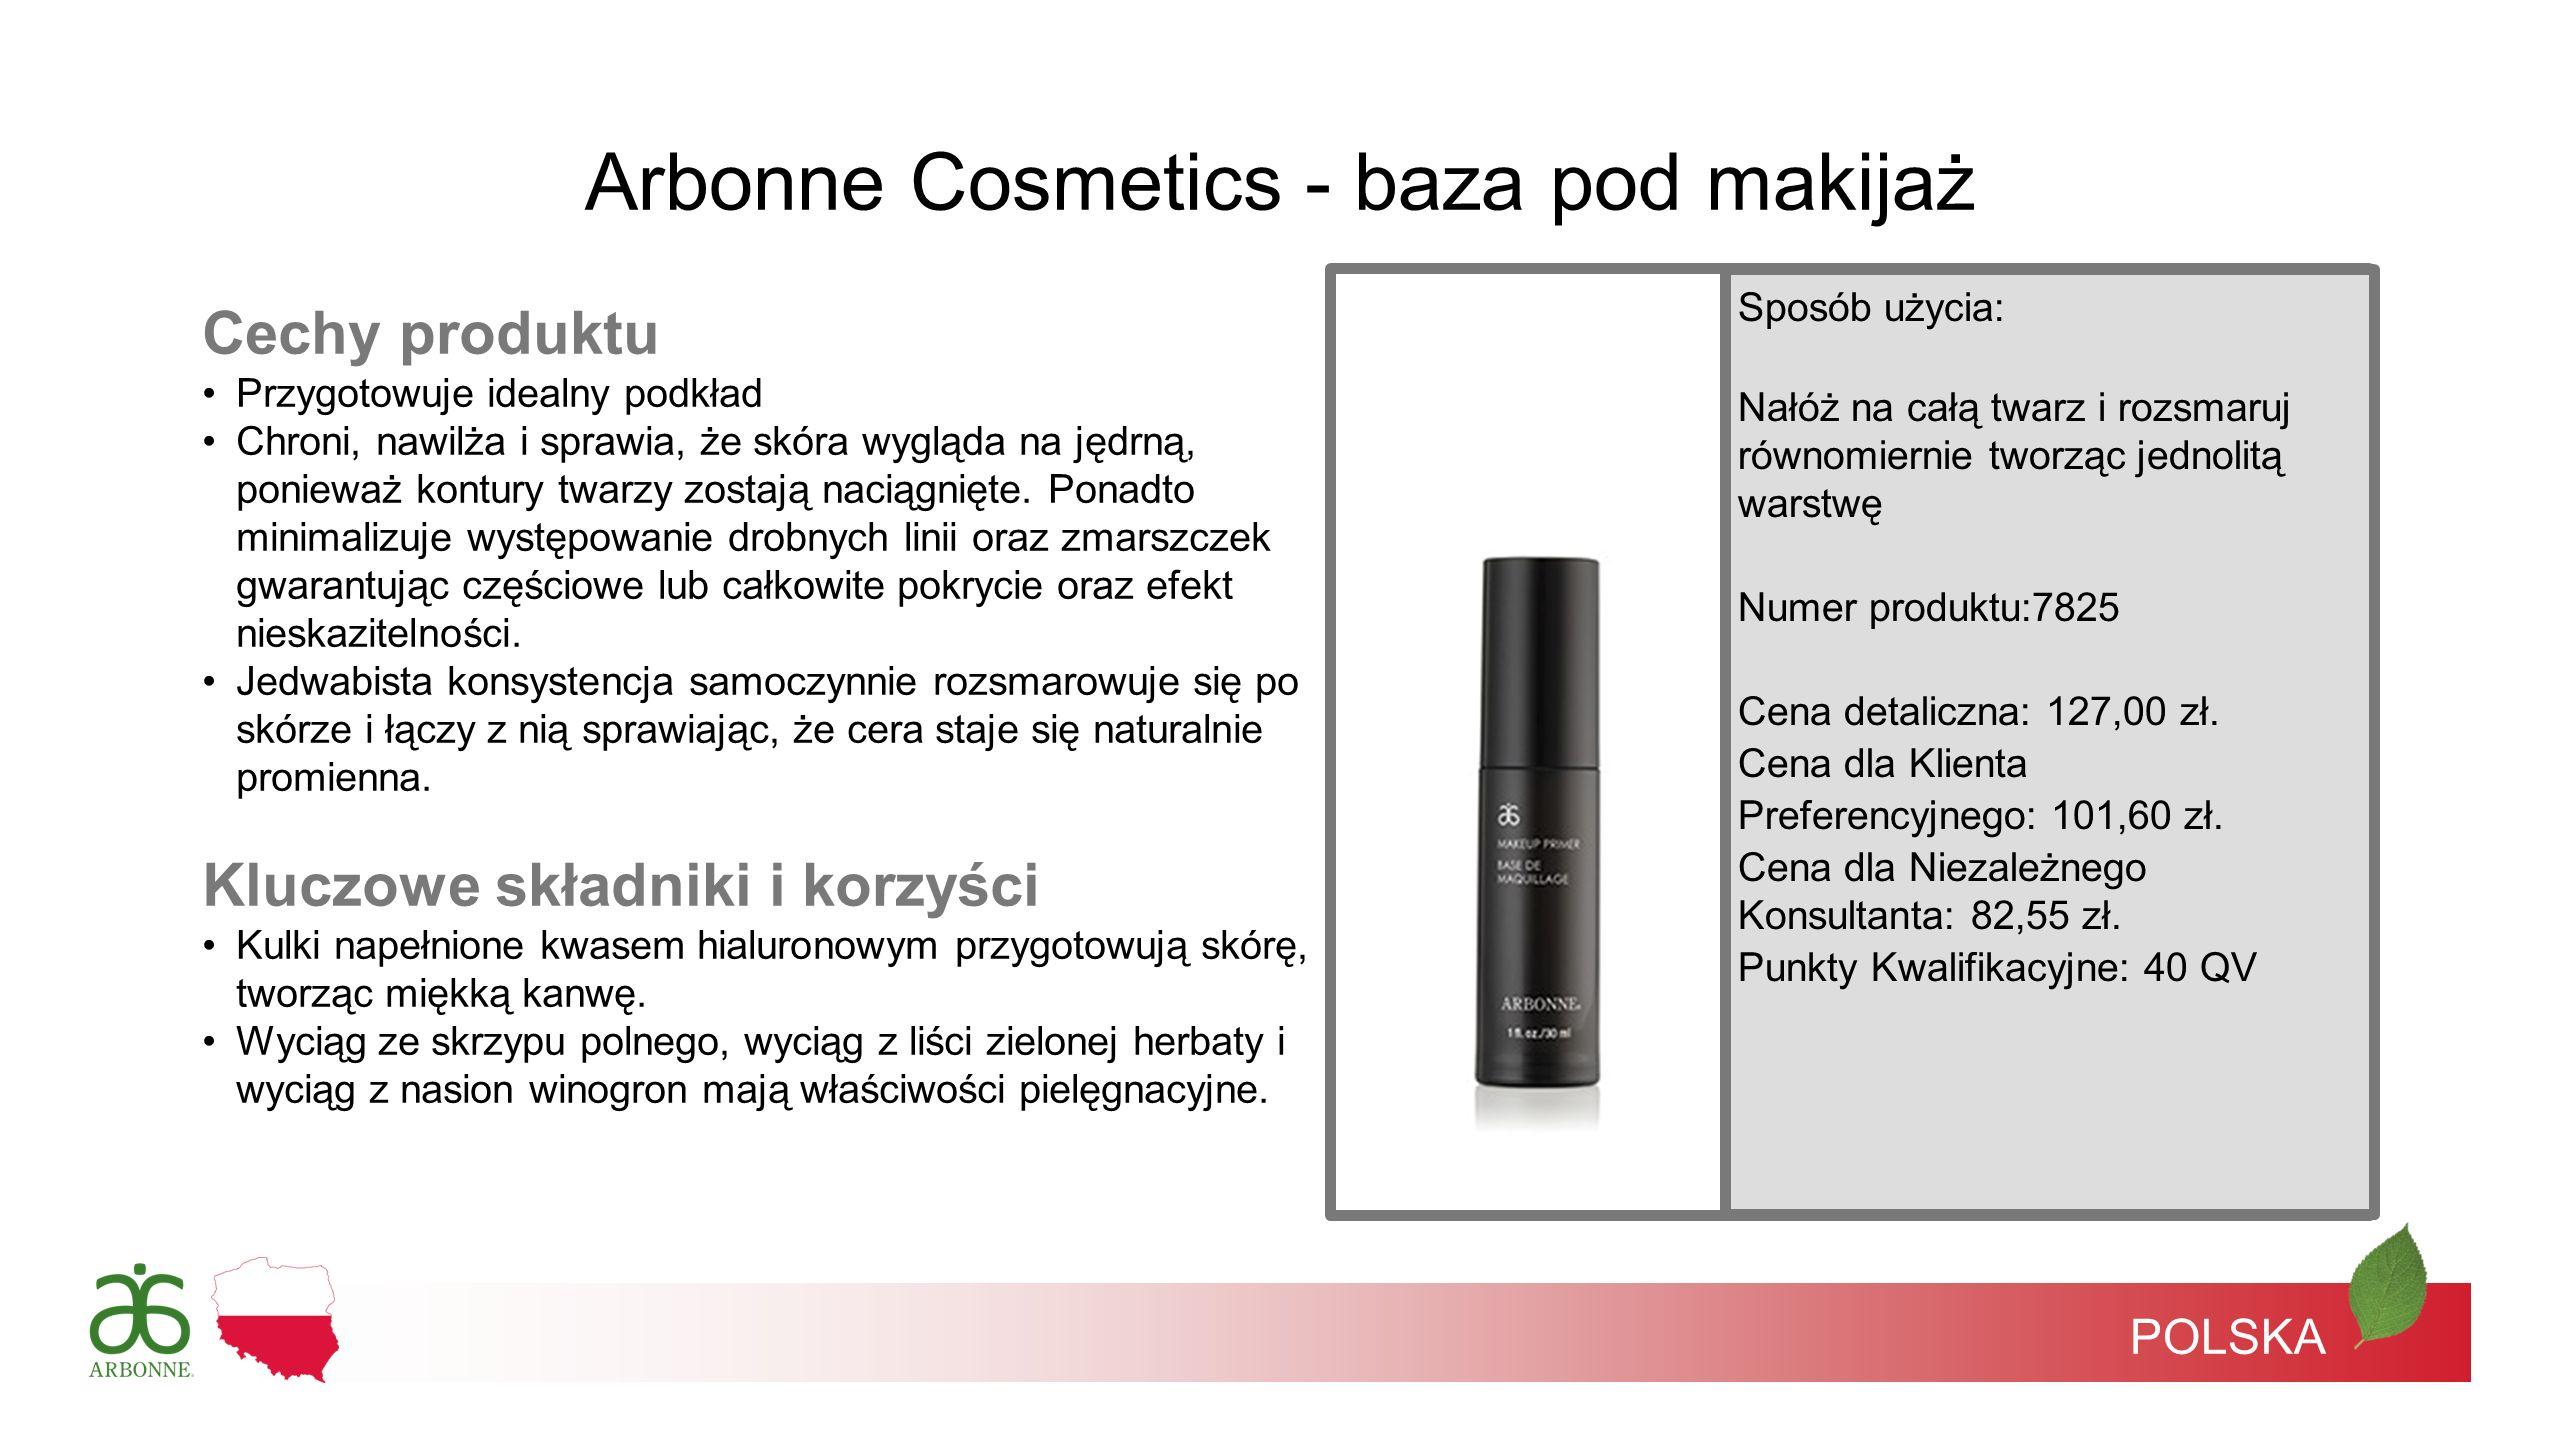 Arbonne Cosmetics - baza pod makijaż